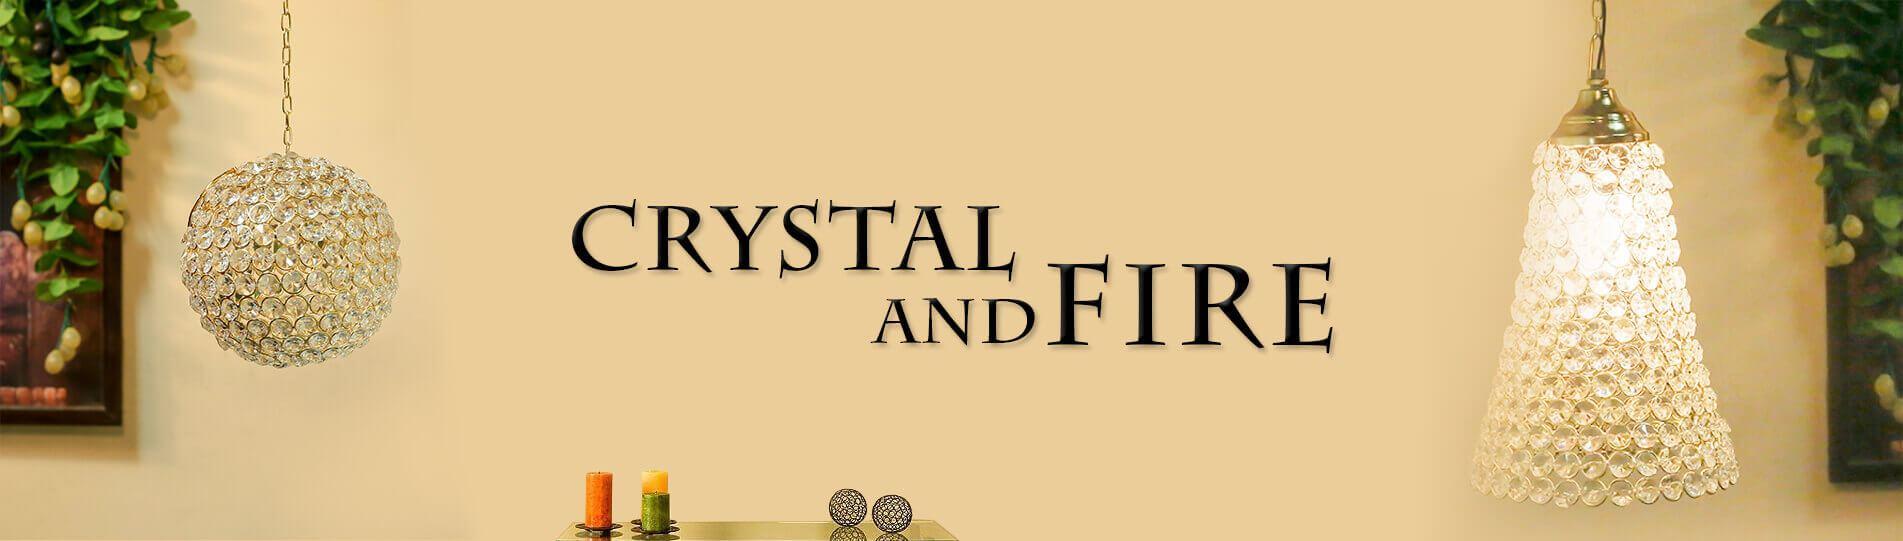 crystalware